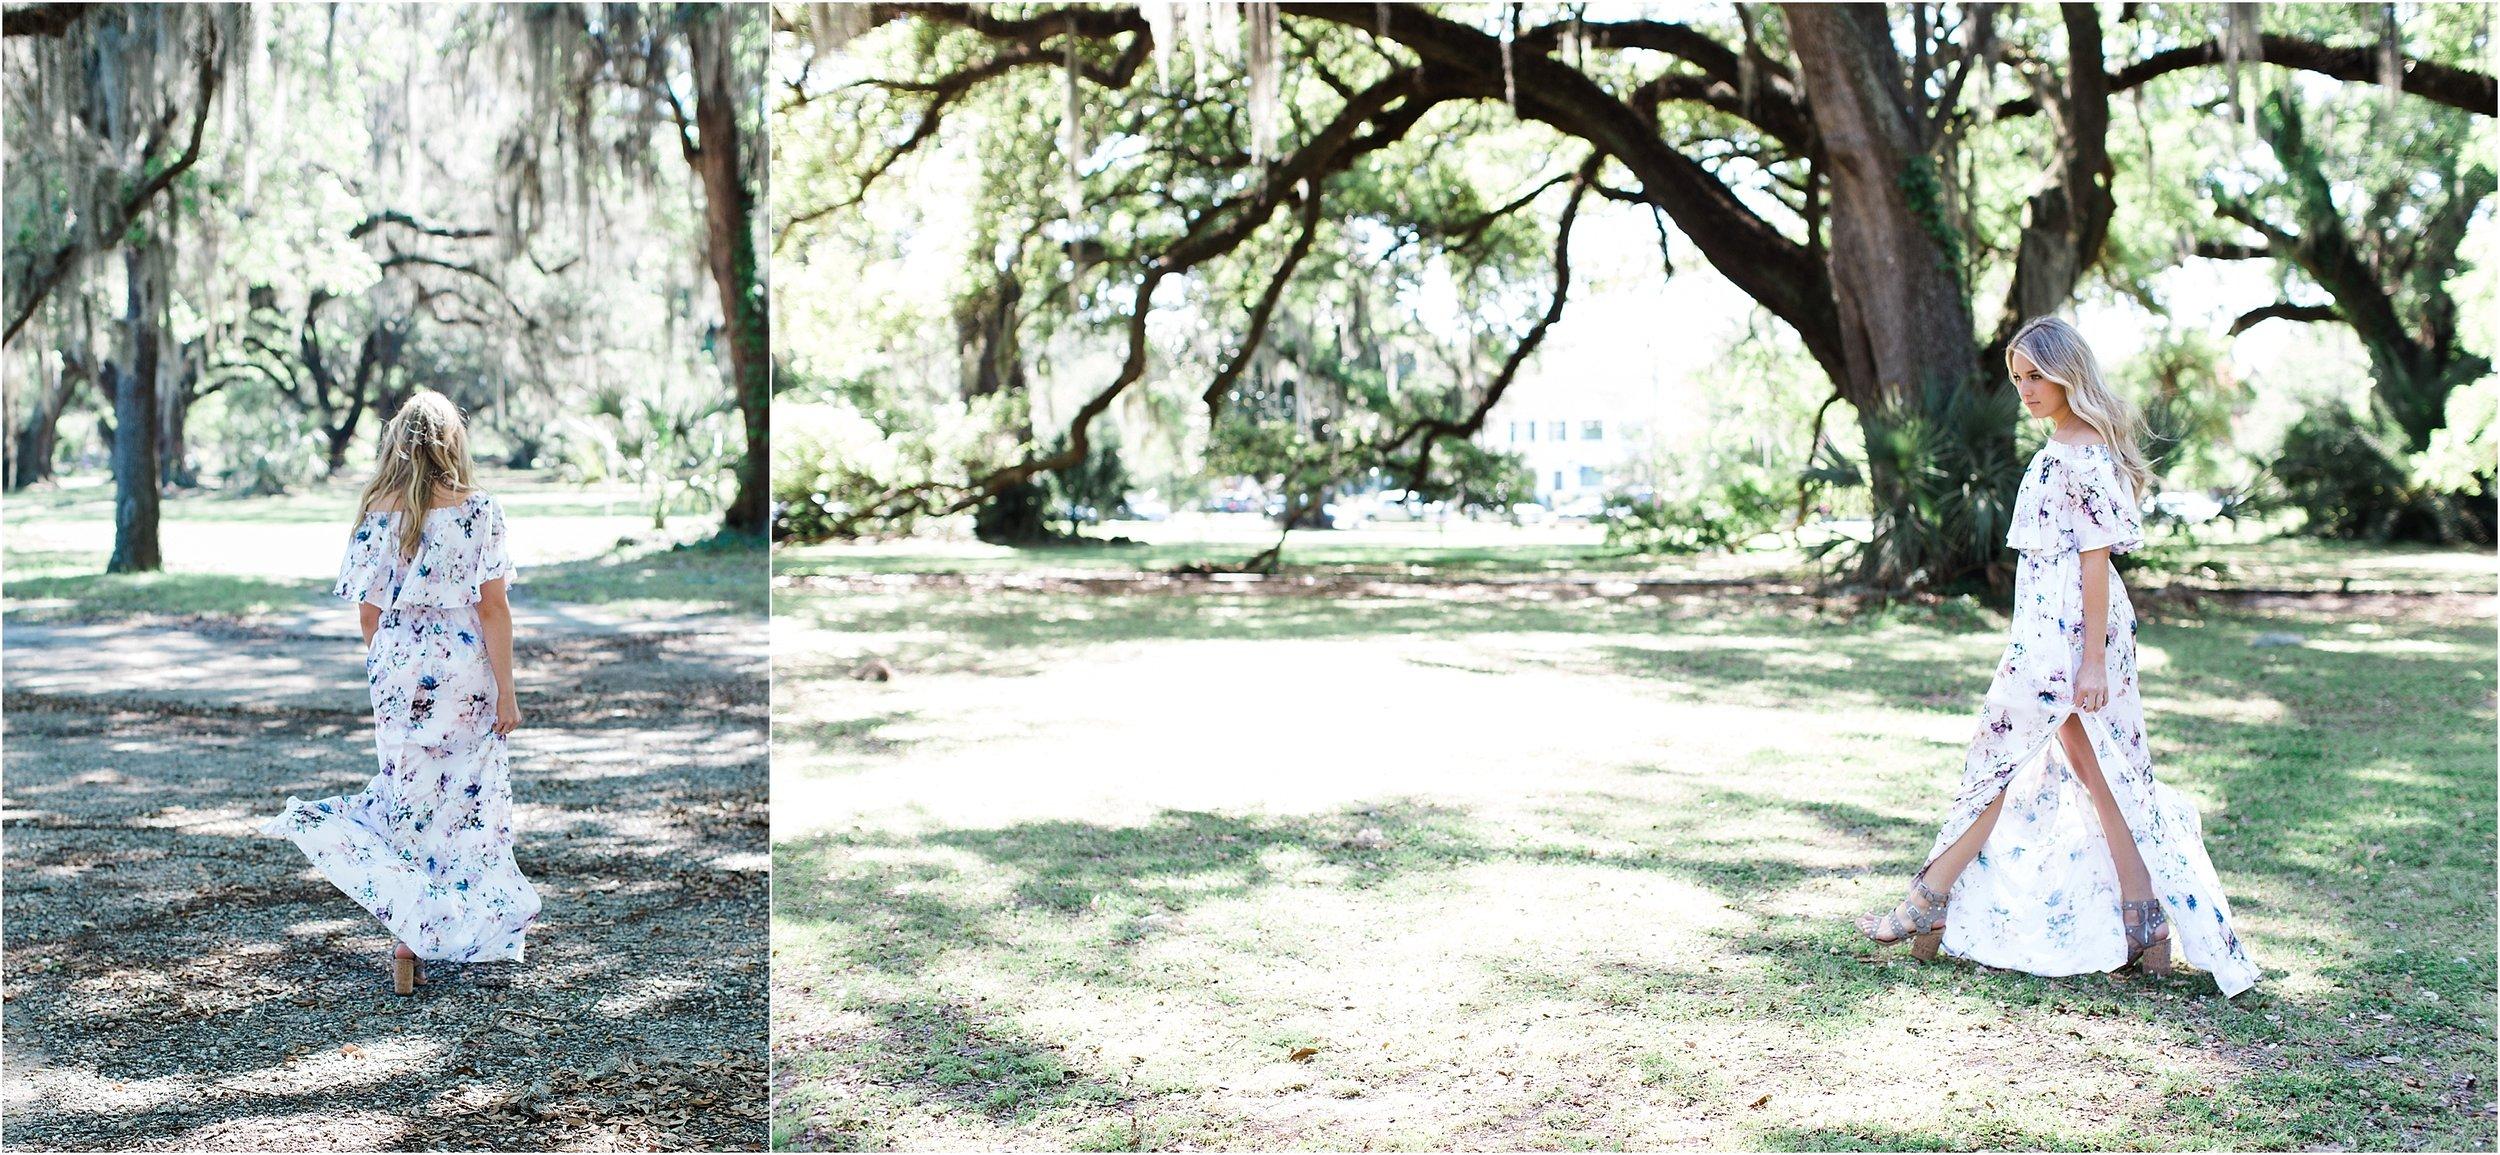 Louisiana-lifestyle-photographer-city-park-proposal_0006.jpg